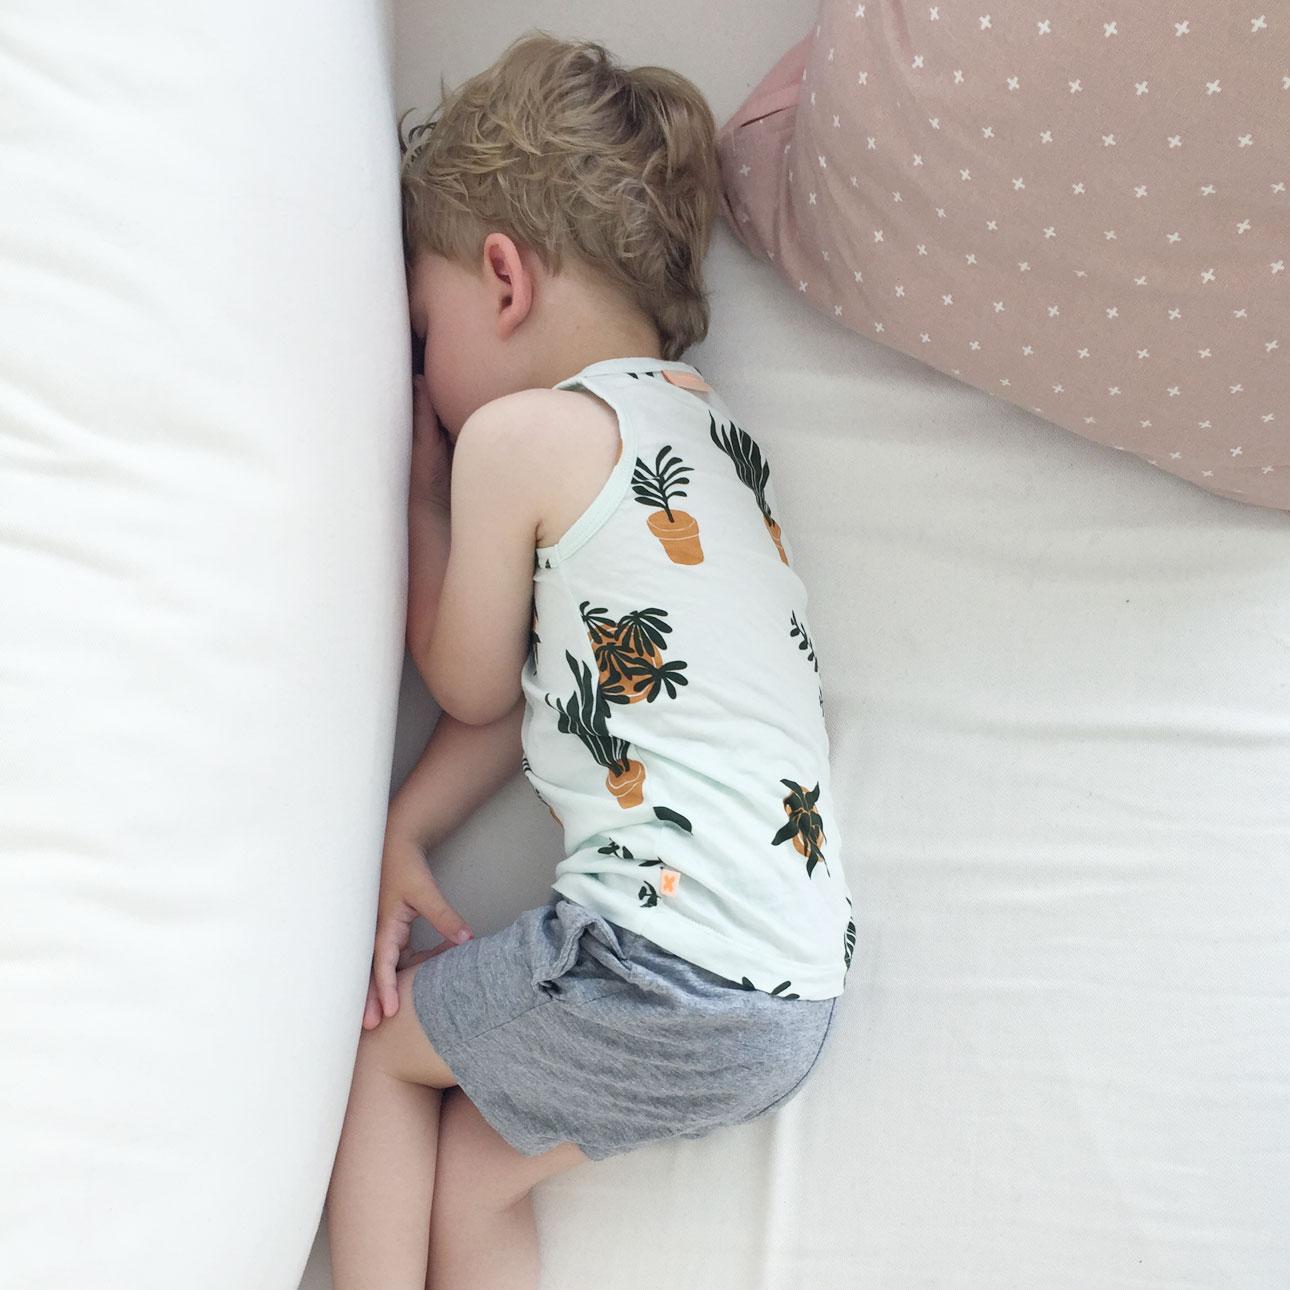 mamalifestyle juli 2016 slapen